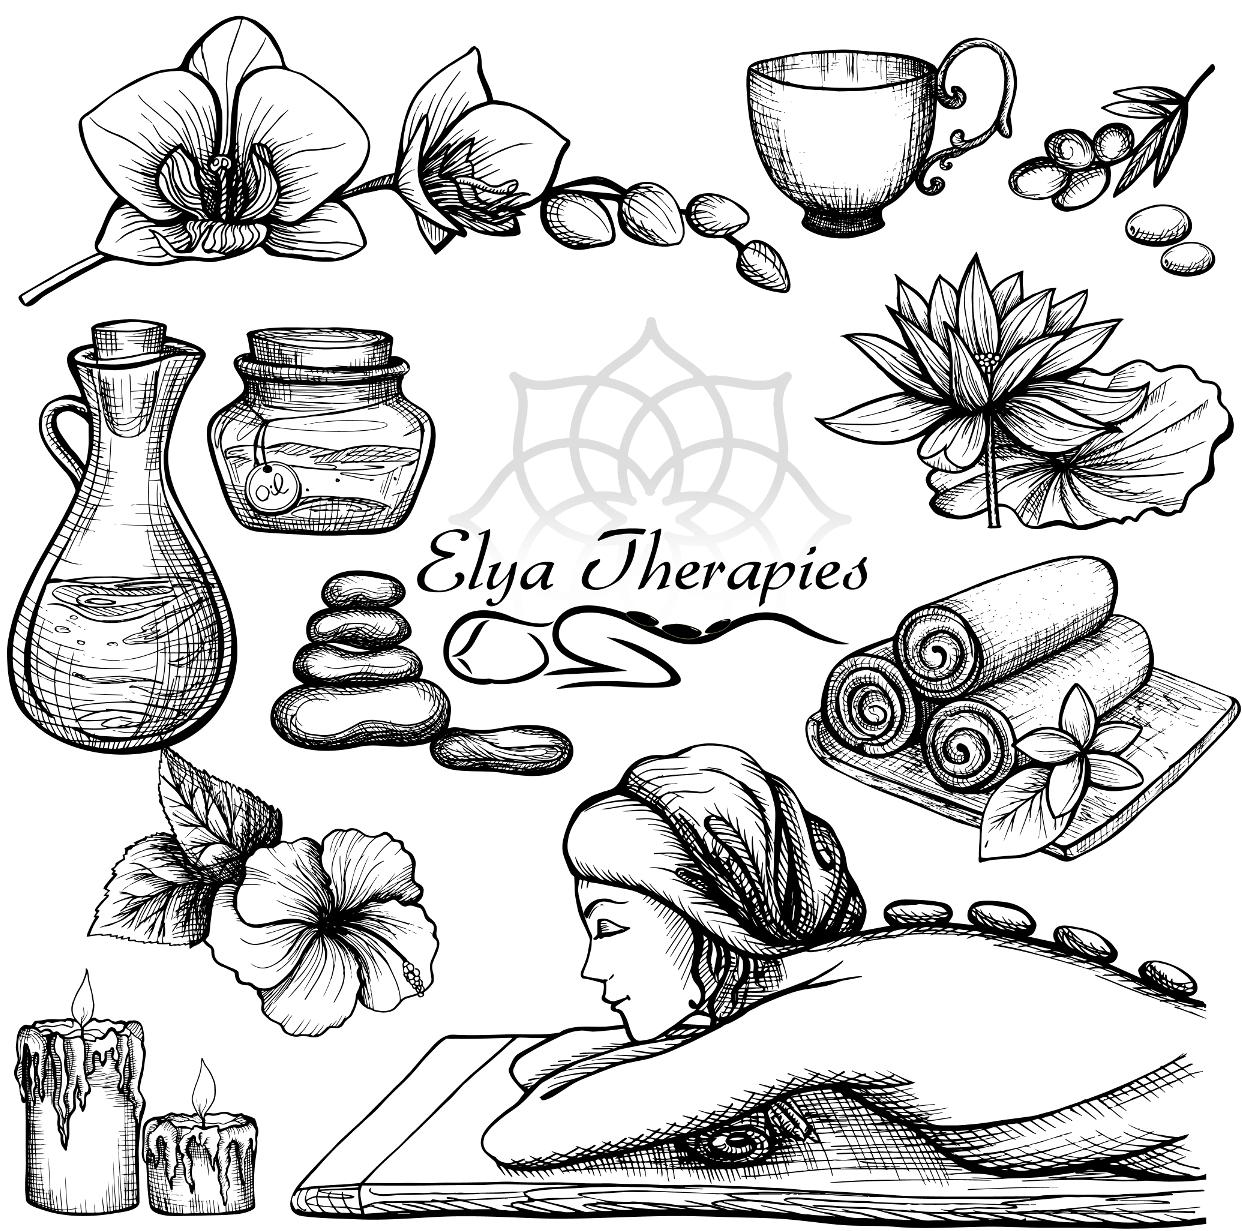 Elya therapies